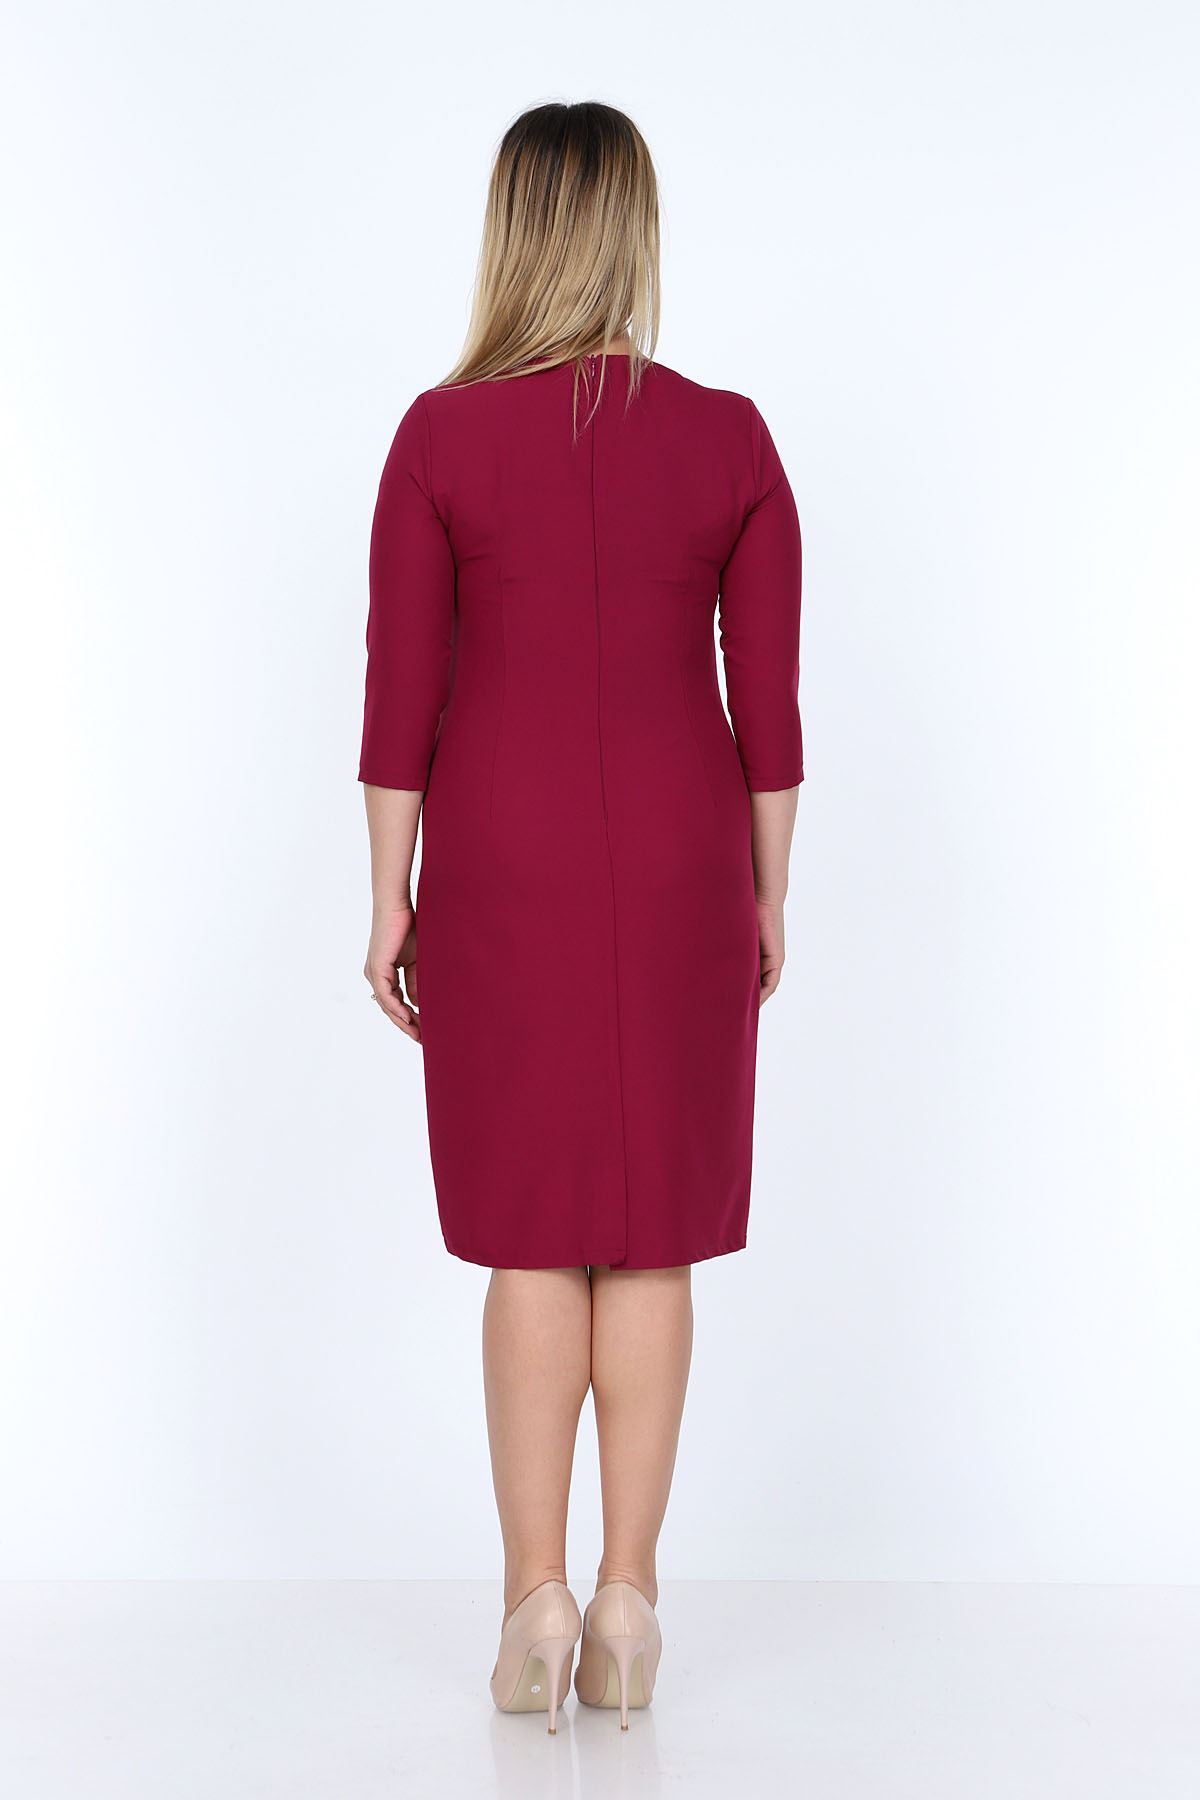 Yetim Kol Elbise 6B-0812